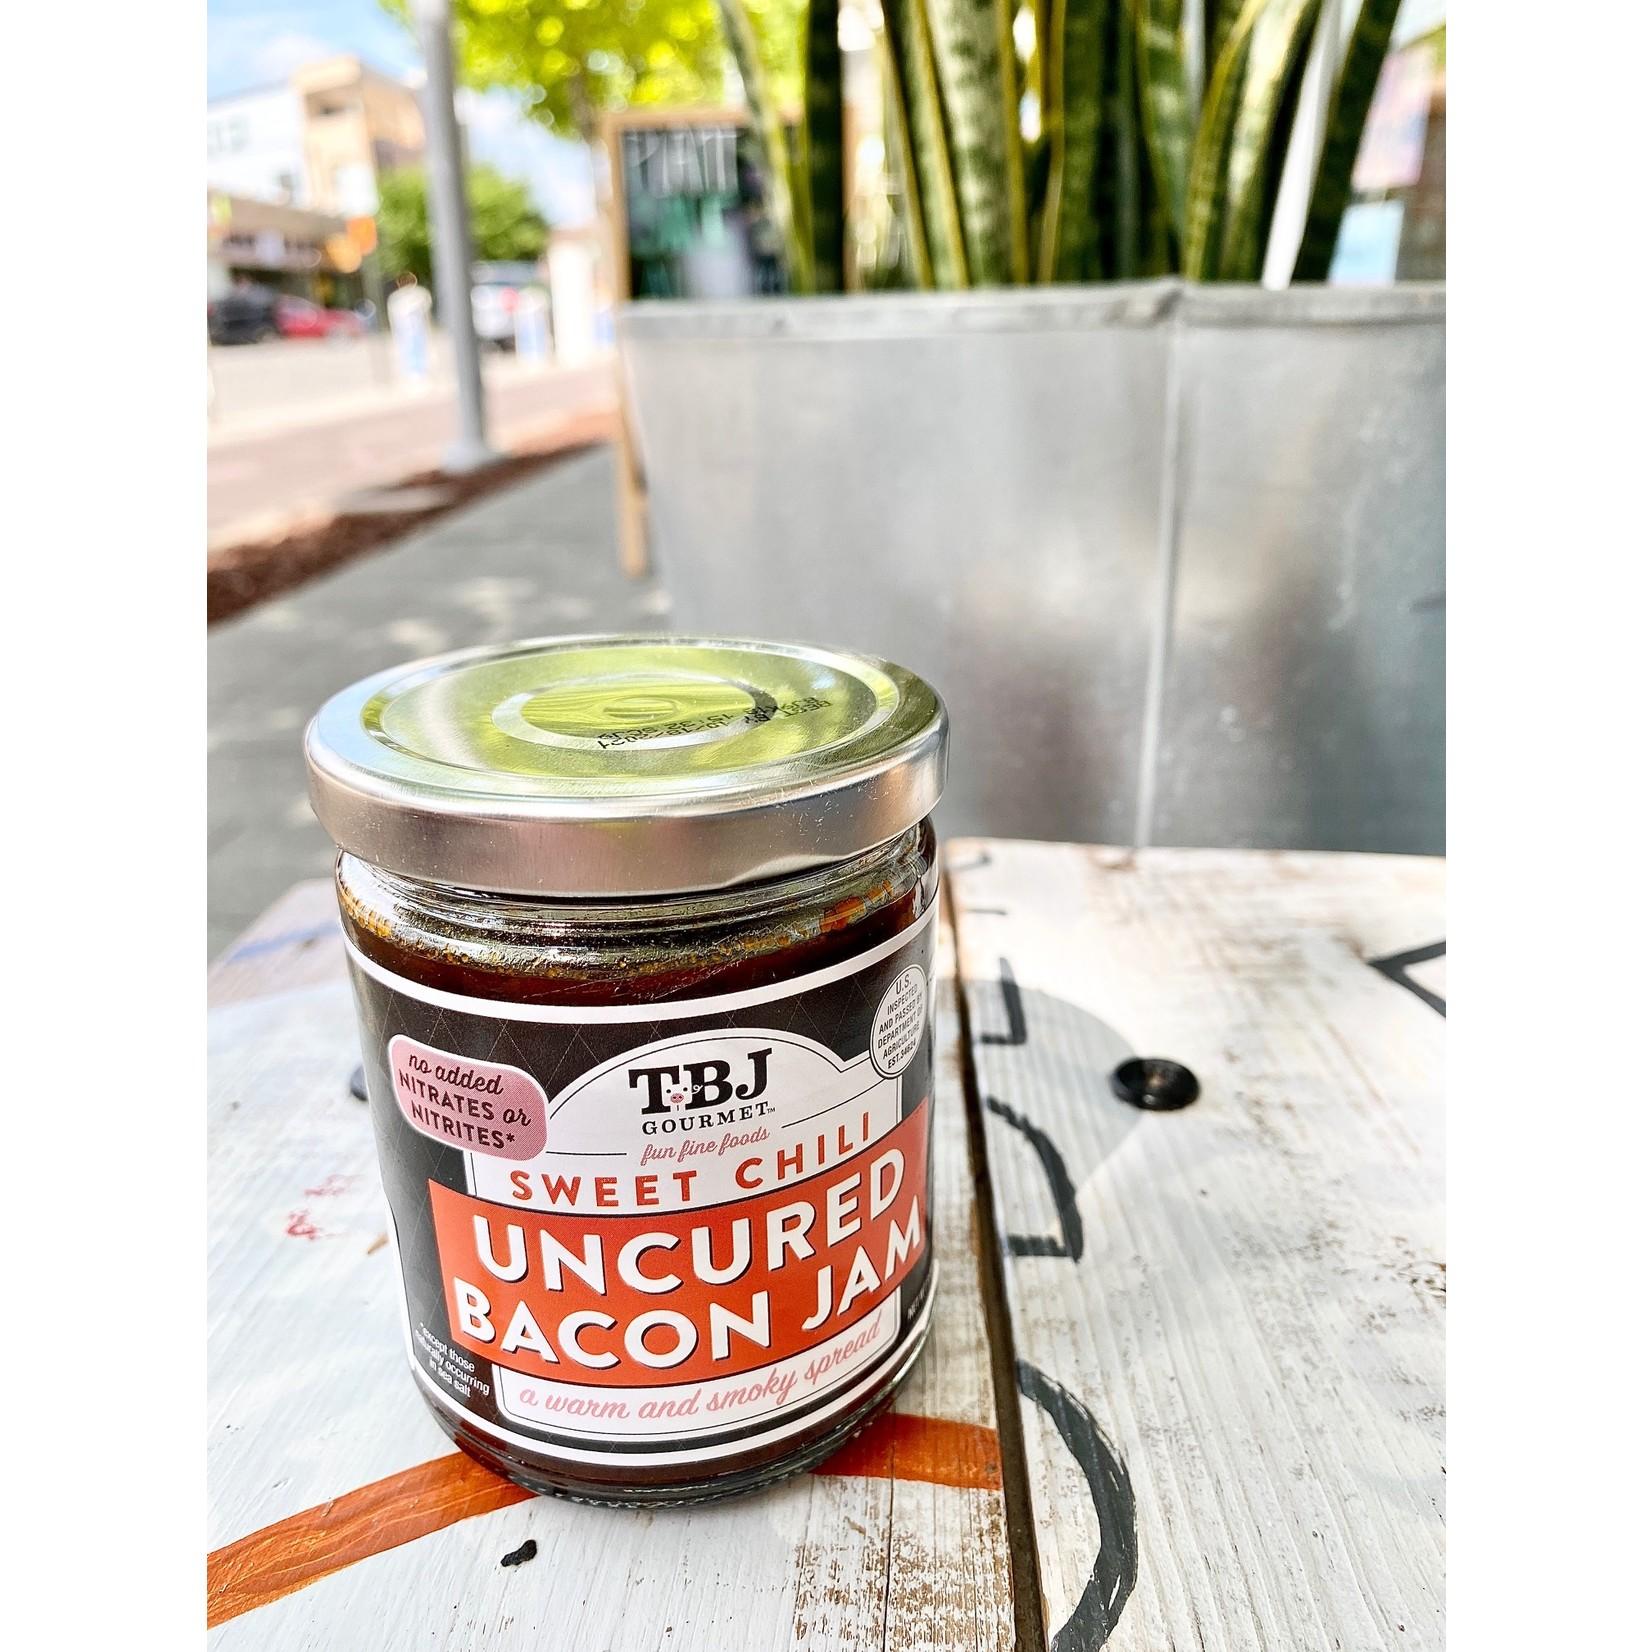 TBJ Gourmet Uncured Bacon Jam